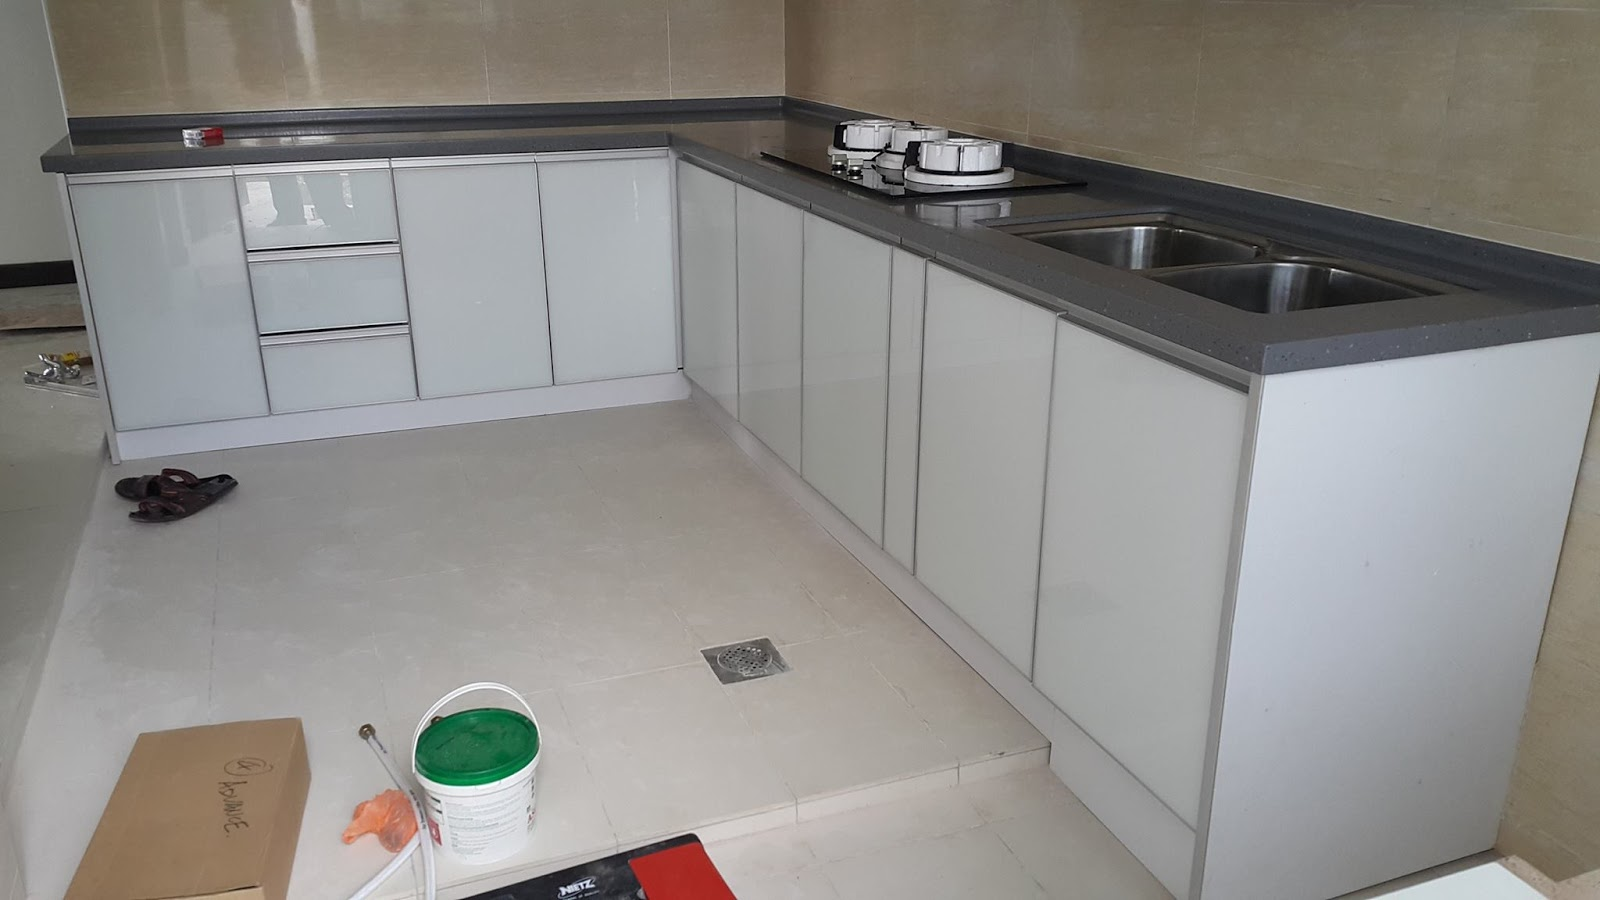 Tempahan pintu kabinet dapur for Table top kitchen cabinet